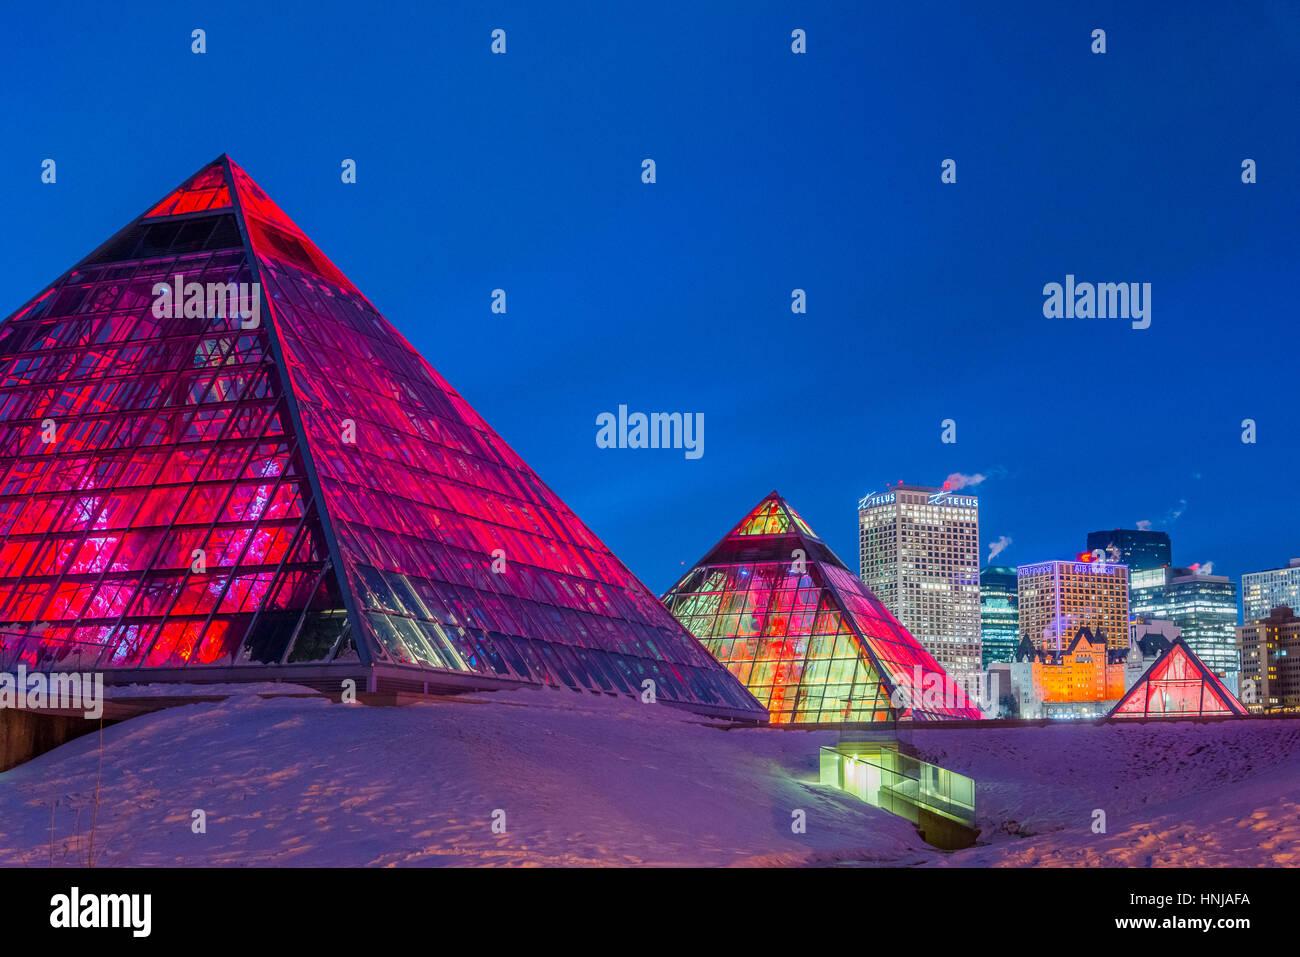 Edmonton skyline iluminado y Conservatorio Muttart pirámides, un jardín botánico en Edmonton, Alberta, Imagen De Stock